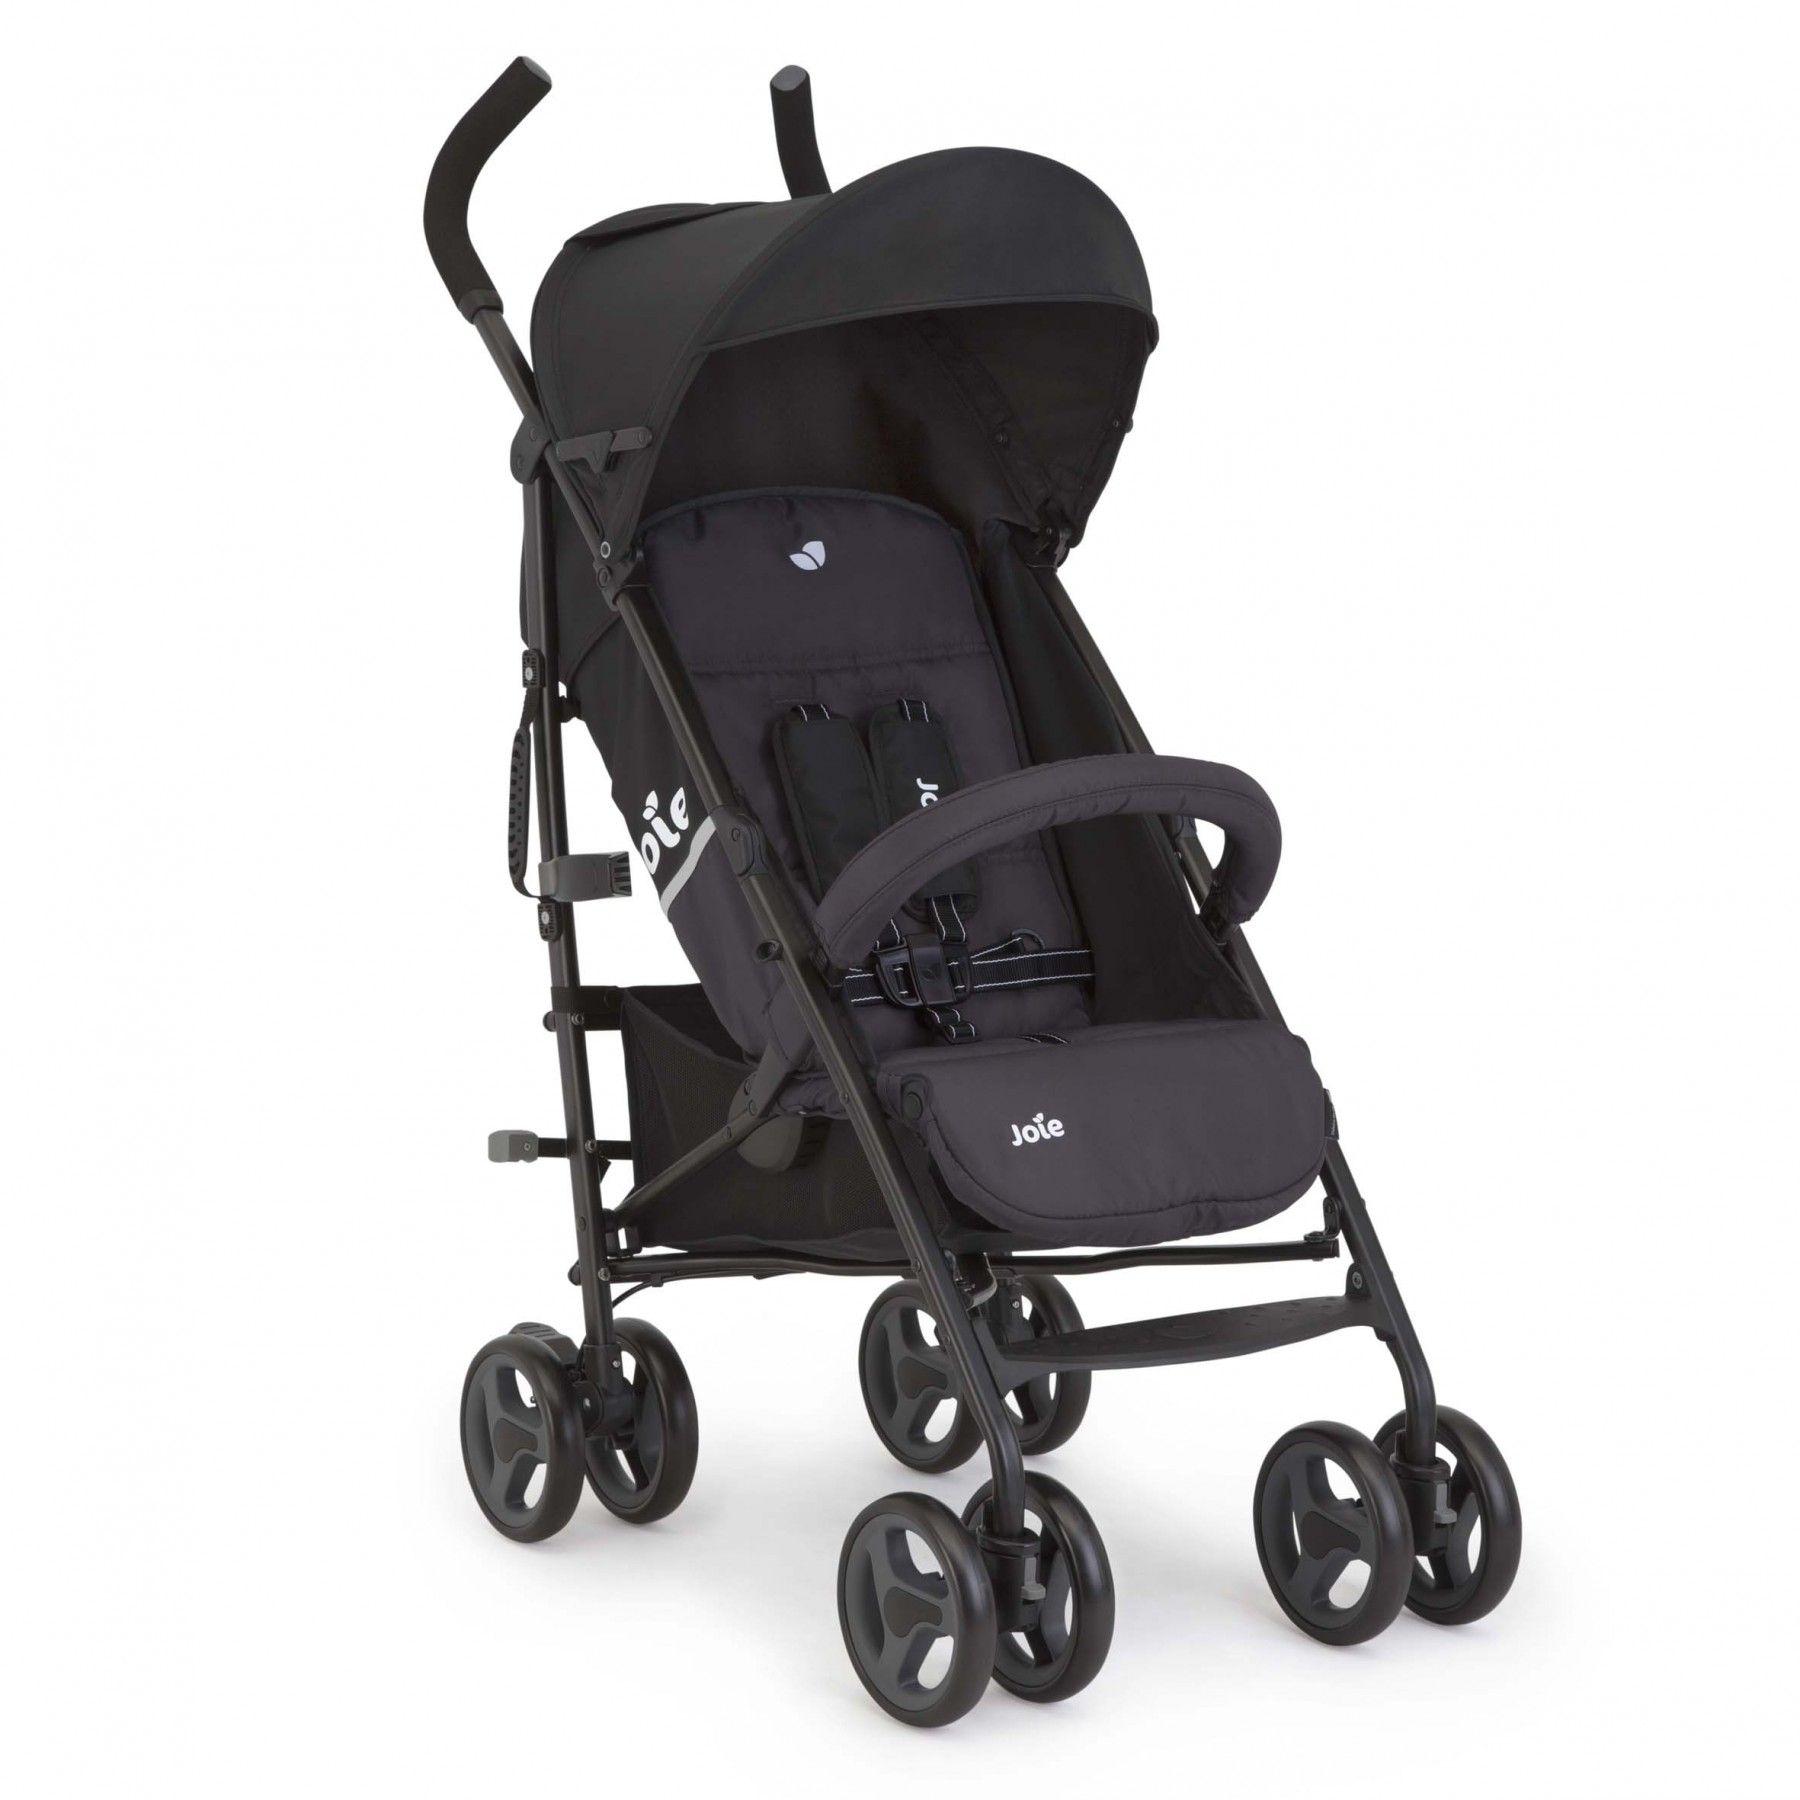 Joie Nitro Stroller Two Tone Black Stroller, Joie baby